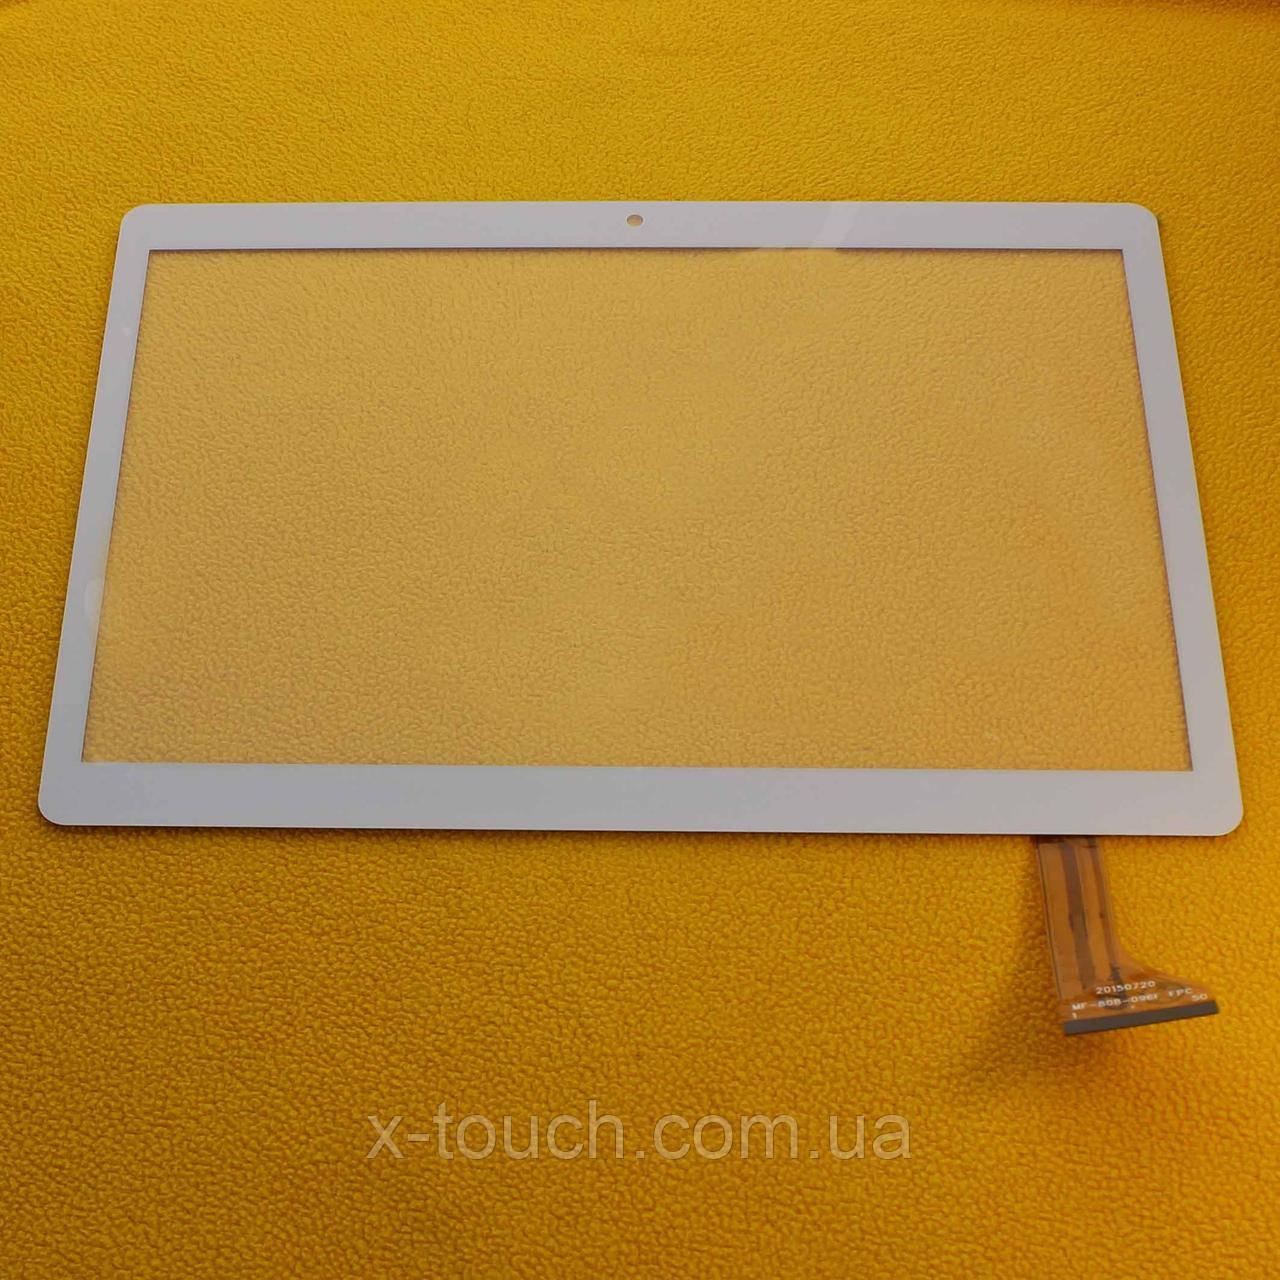 Тачскрин, сенсор DH-1069A4-PG-FPC264-V1.0 белый для планшета